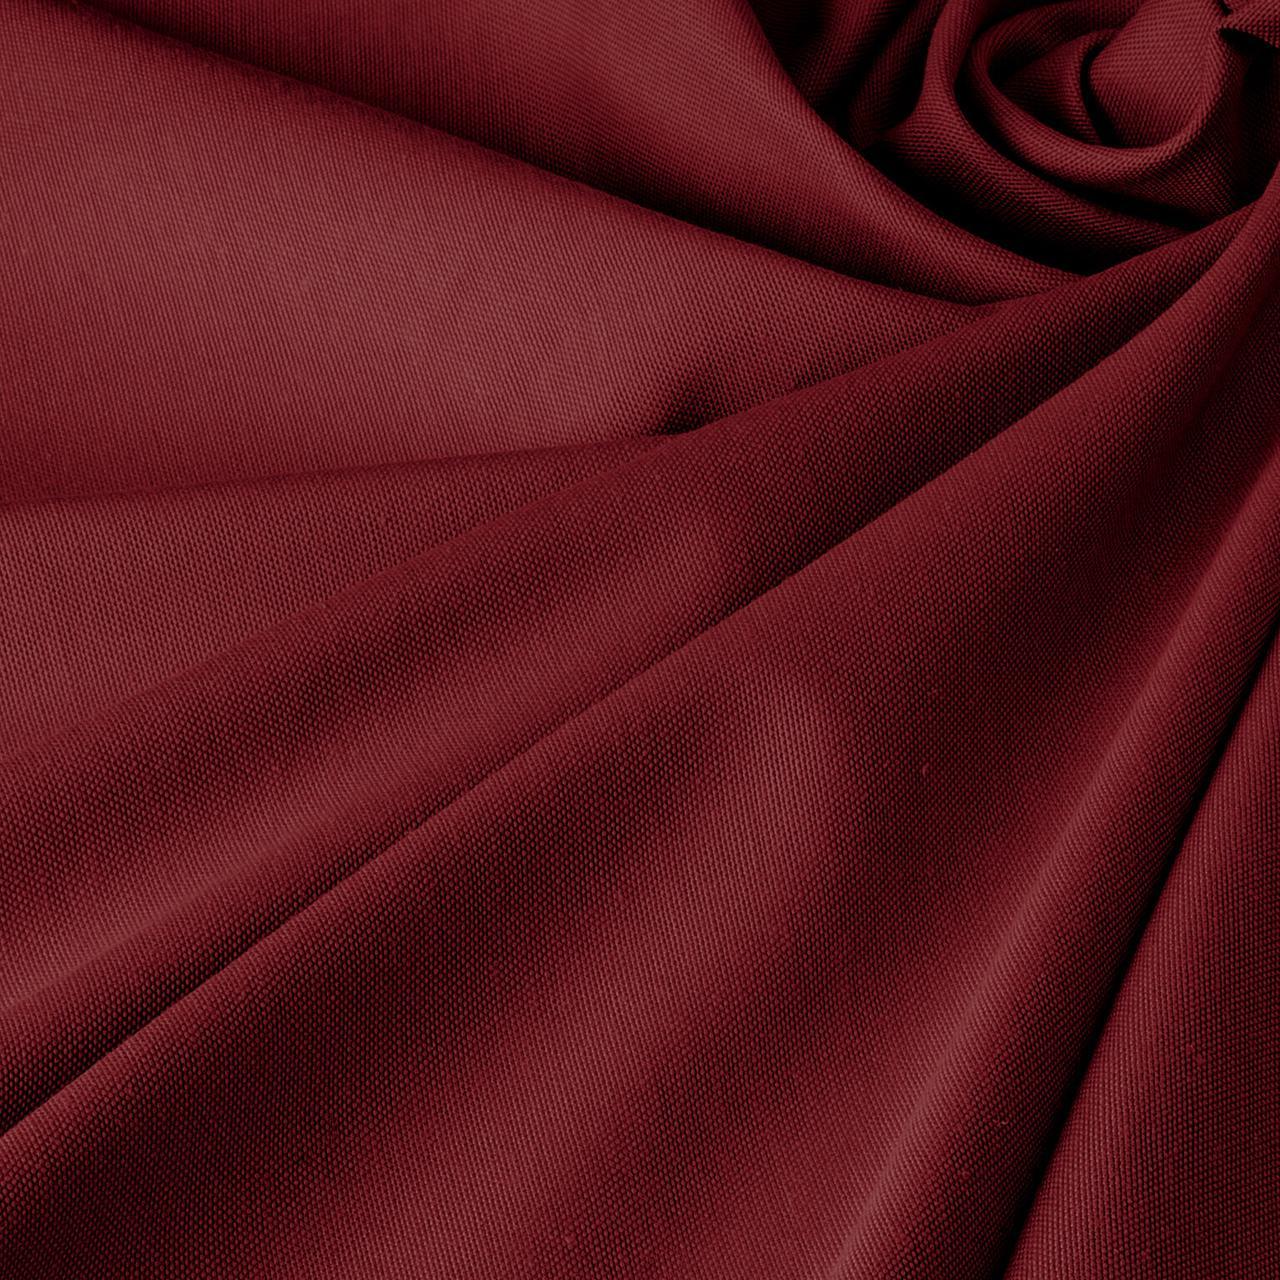 Ткань для штор и скатертей Teflon DRK v 7154